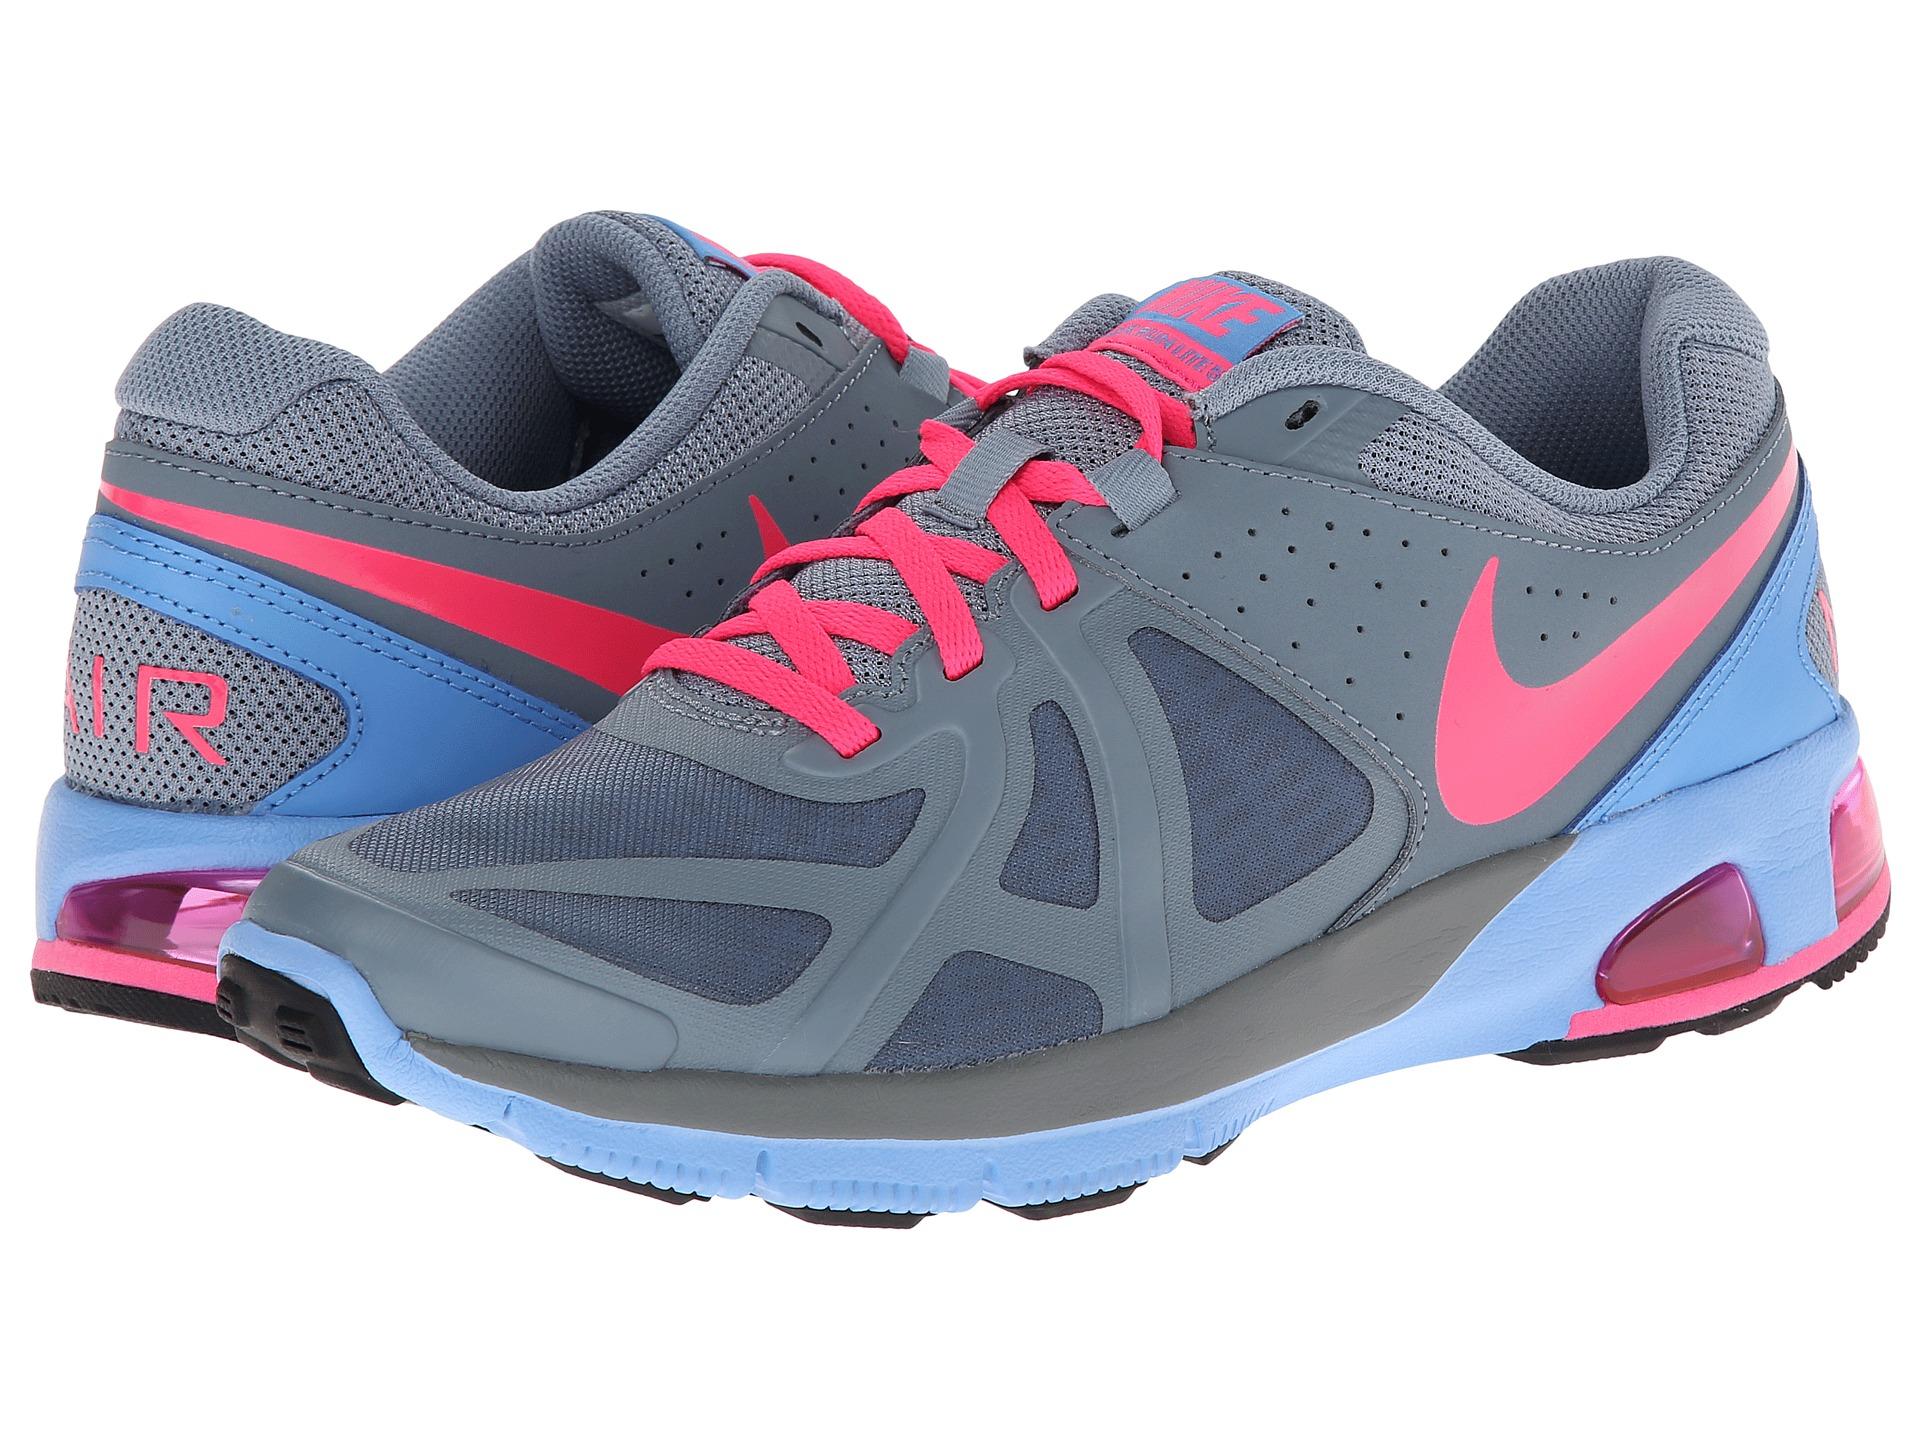 b9029c7edebc Lyst - Nike Air Max Run Lite 5 in Gray